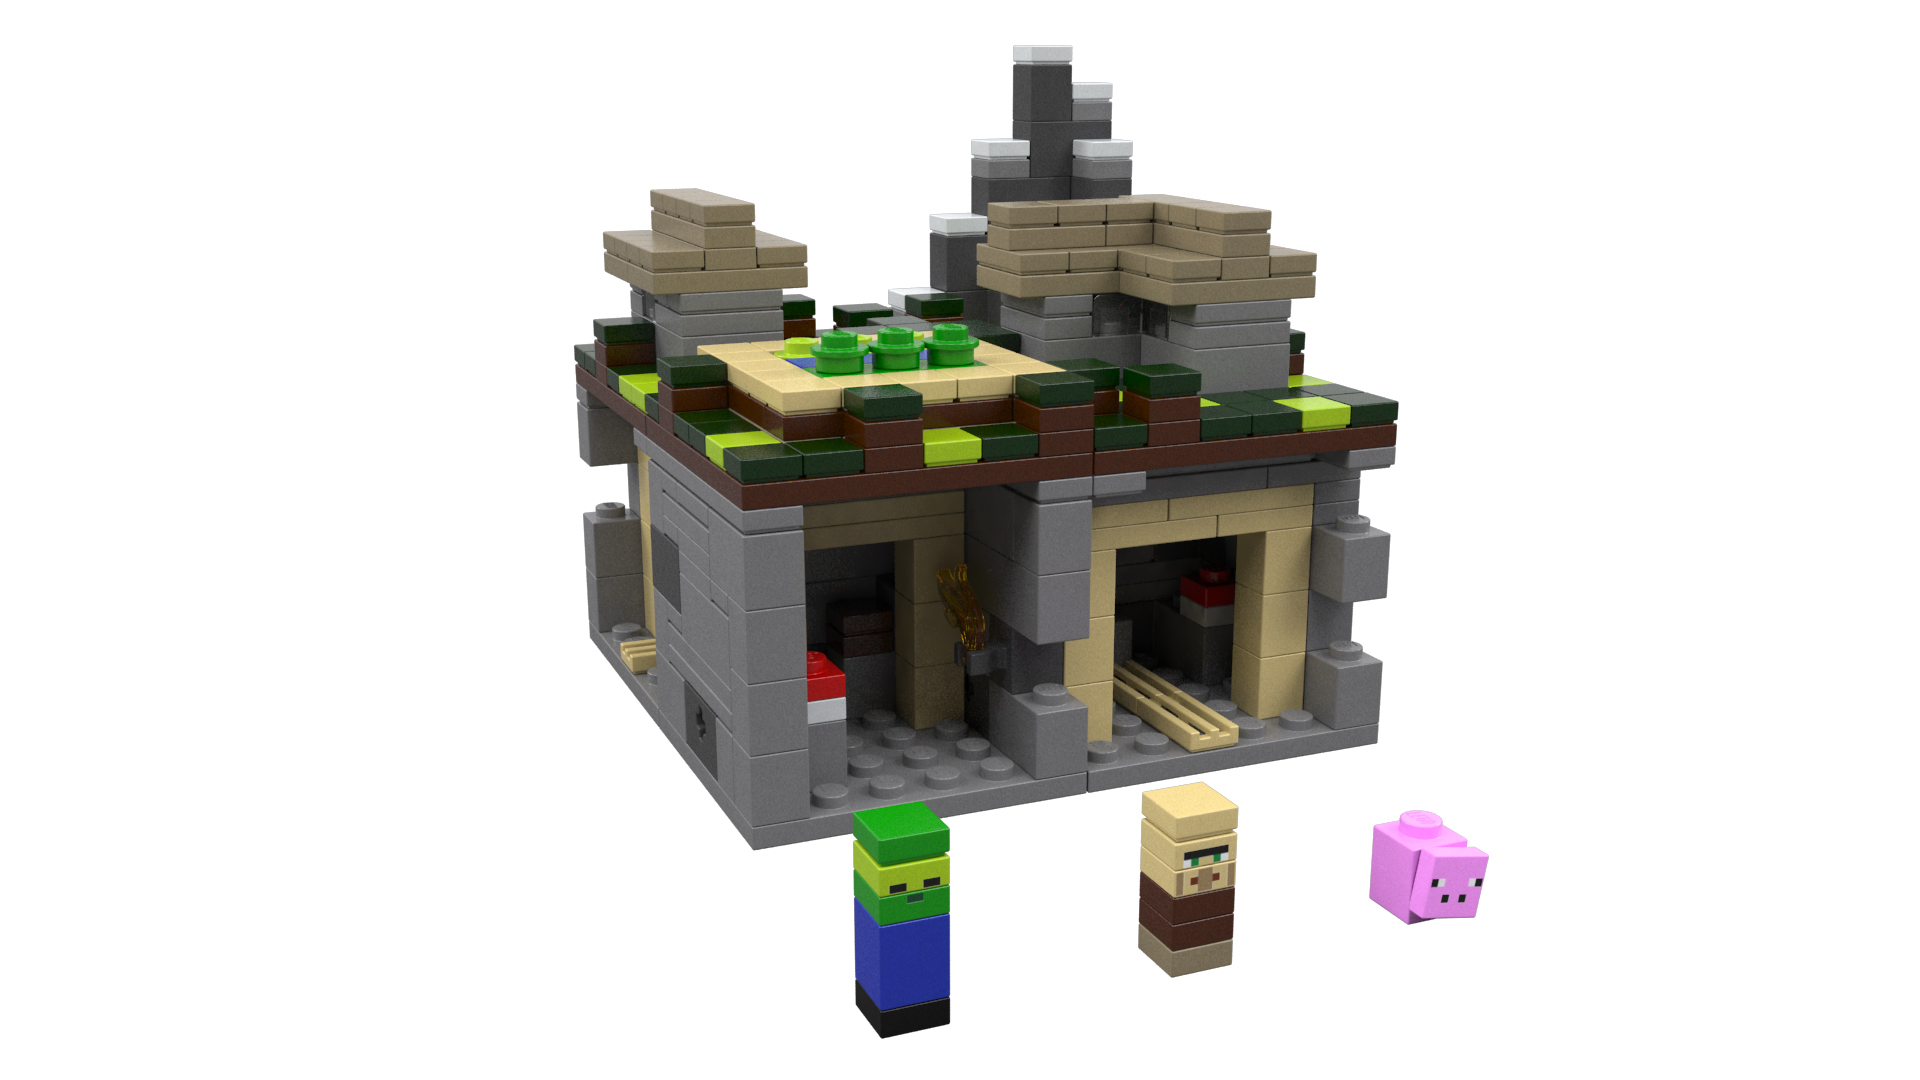 Sdcc] lego announces minecraft collection